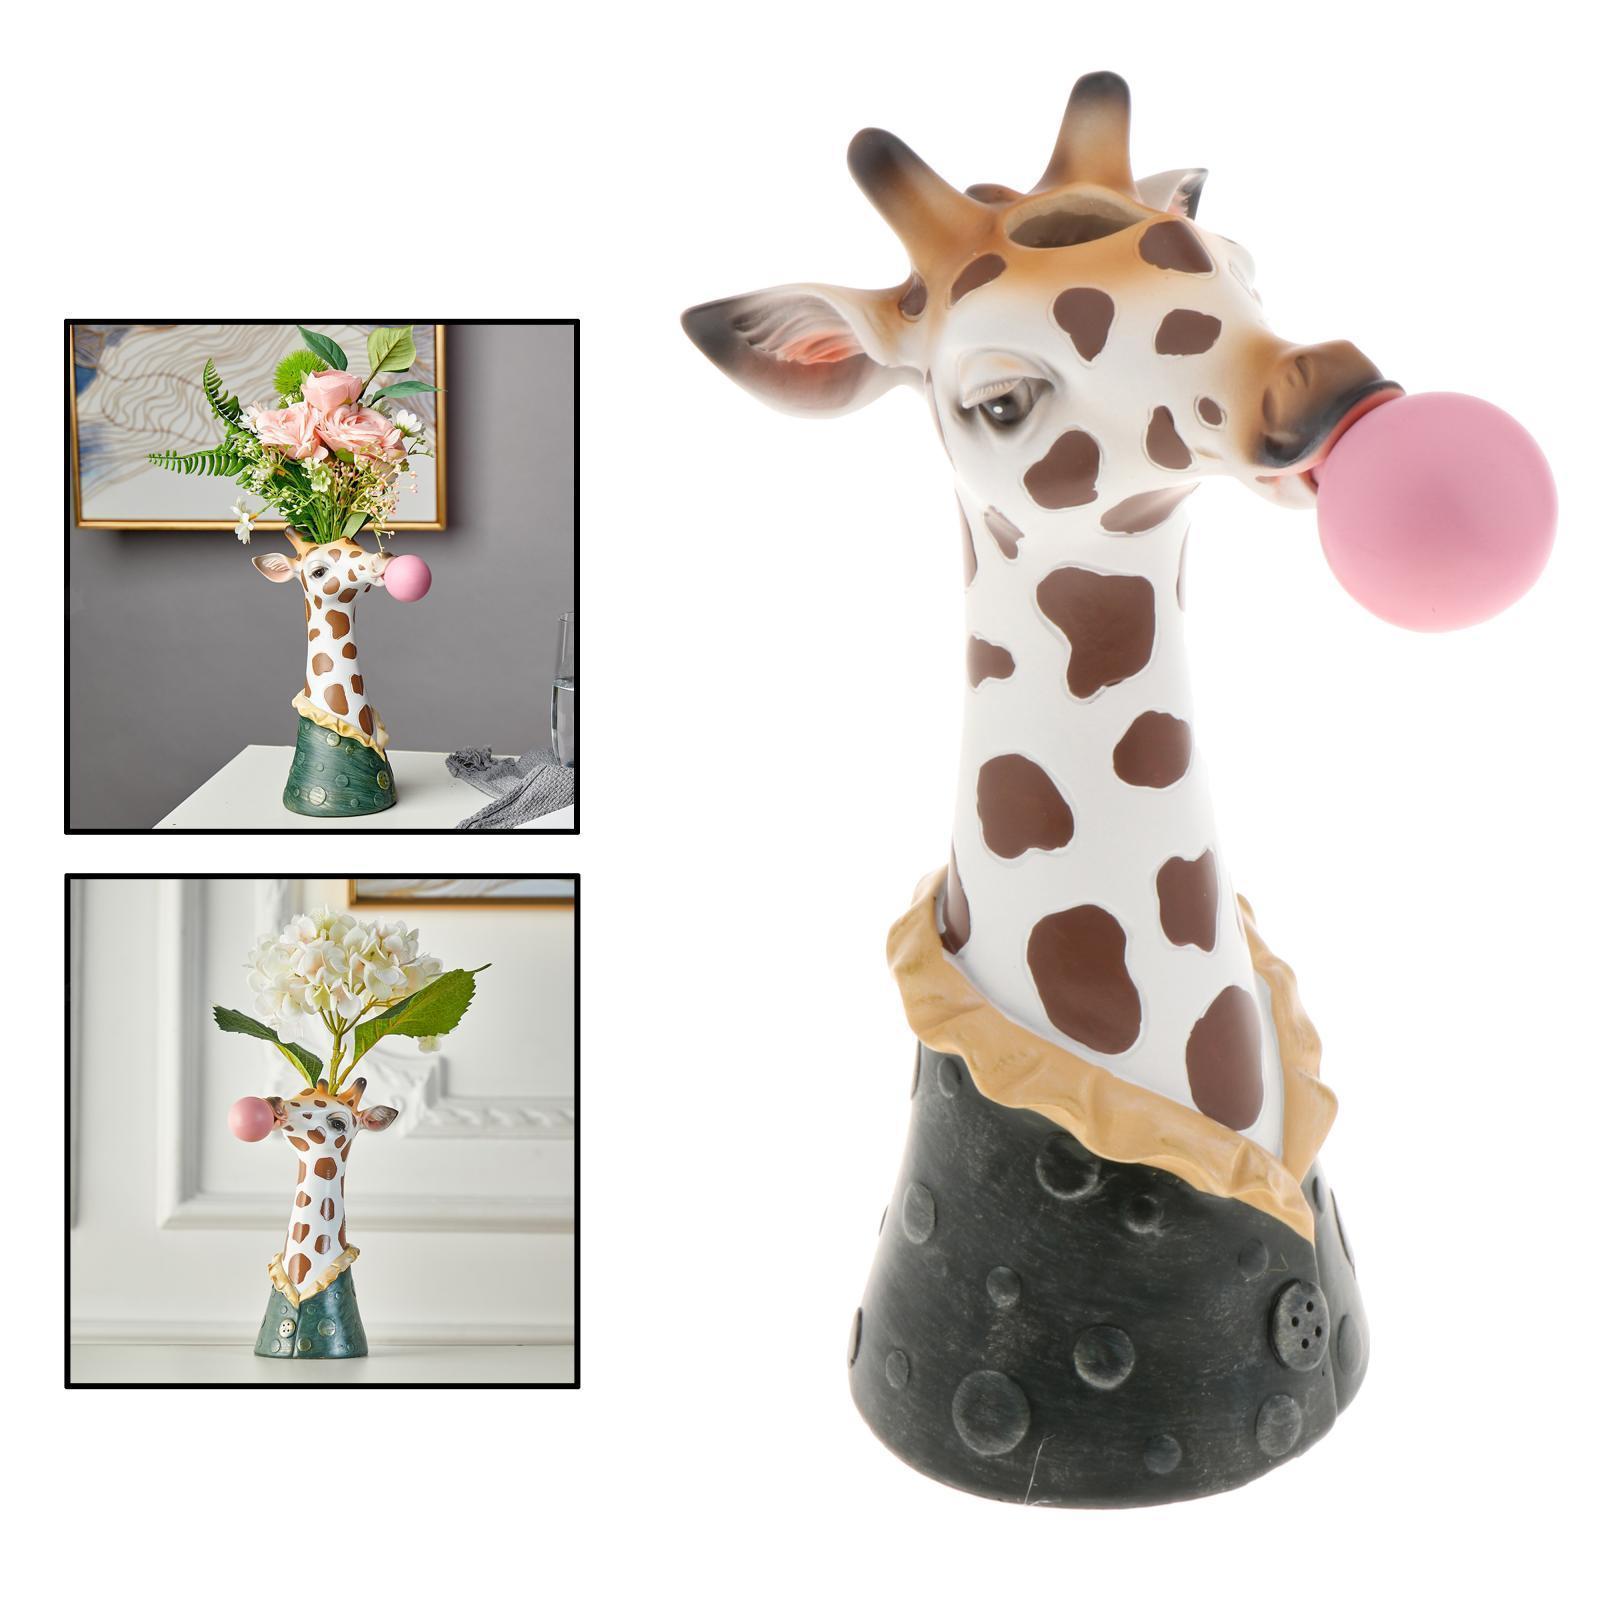 Indexbild 3 - Harz Tierkopf Trockenblume Vase Pflanzer Topf Home Office Bar Desktop Ornament